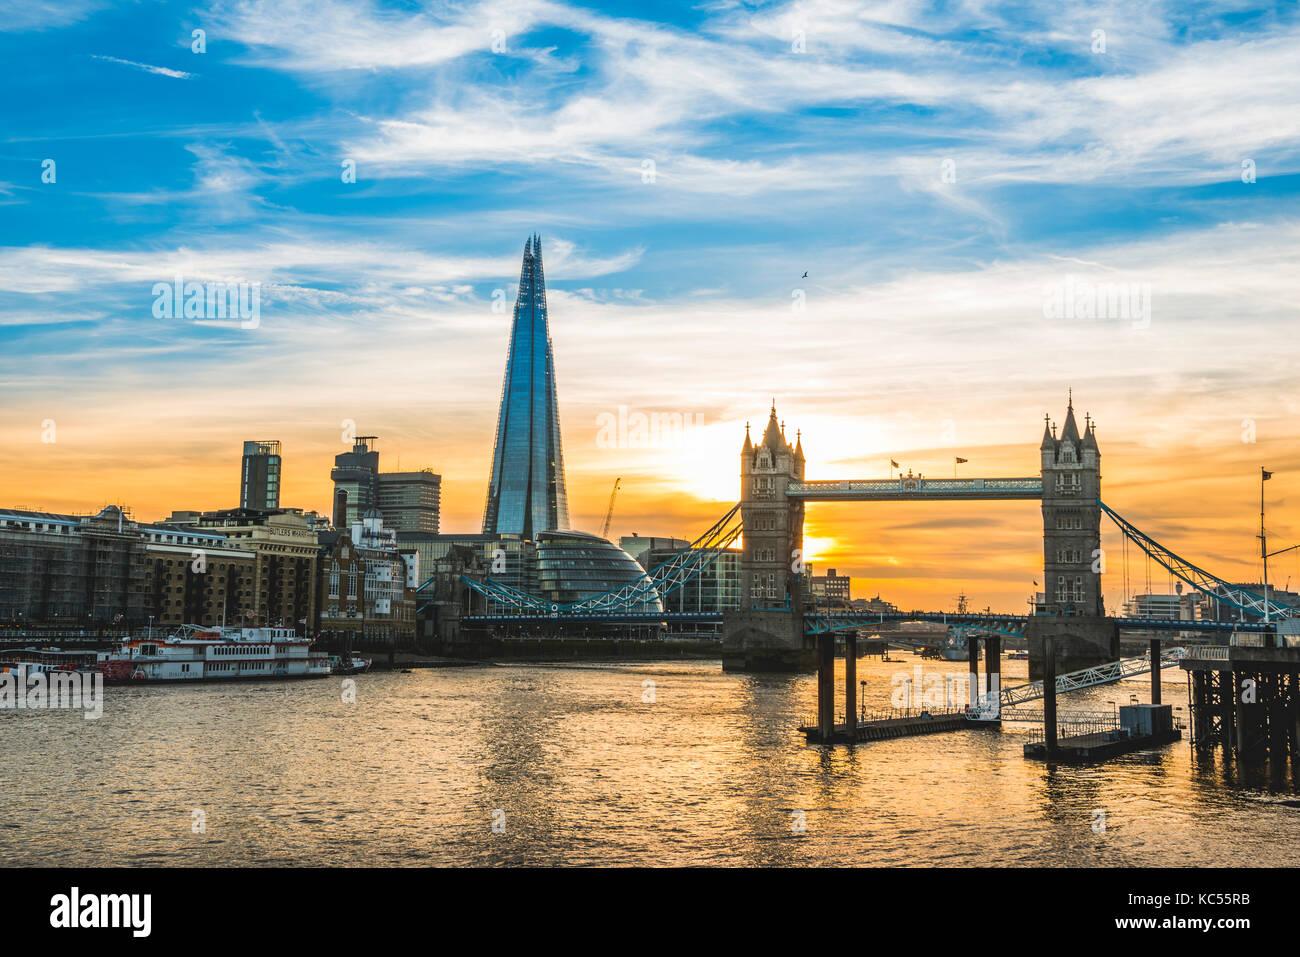 Themse, Themse, Tower Bridge, Shard, sonnenuntergang, wasserspiegelung, Southwark, st katharine & Wapping, Londra, Immagini Stock